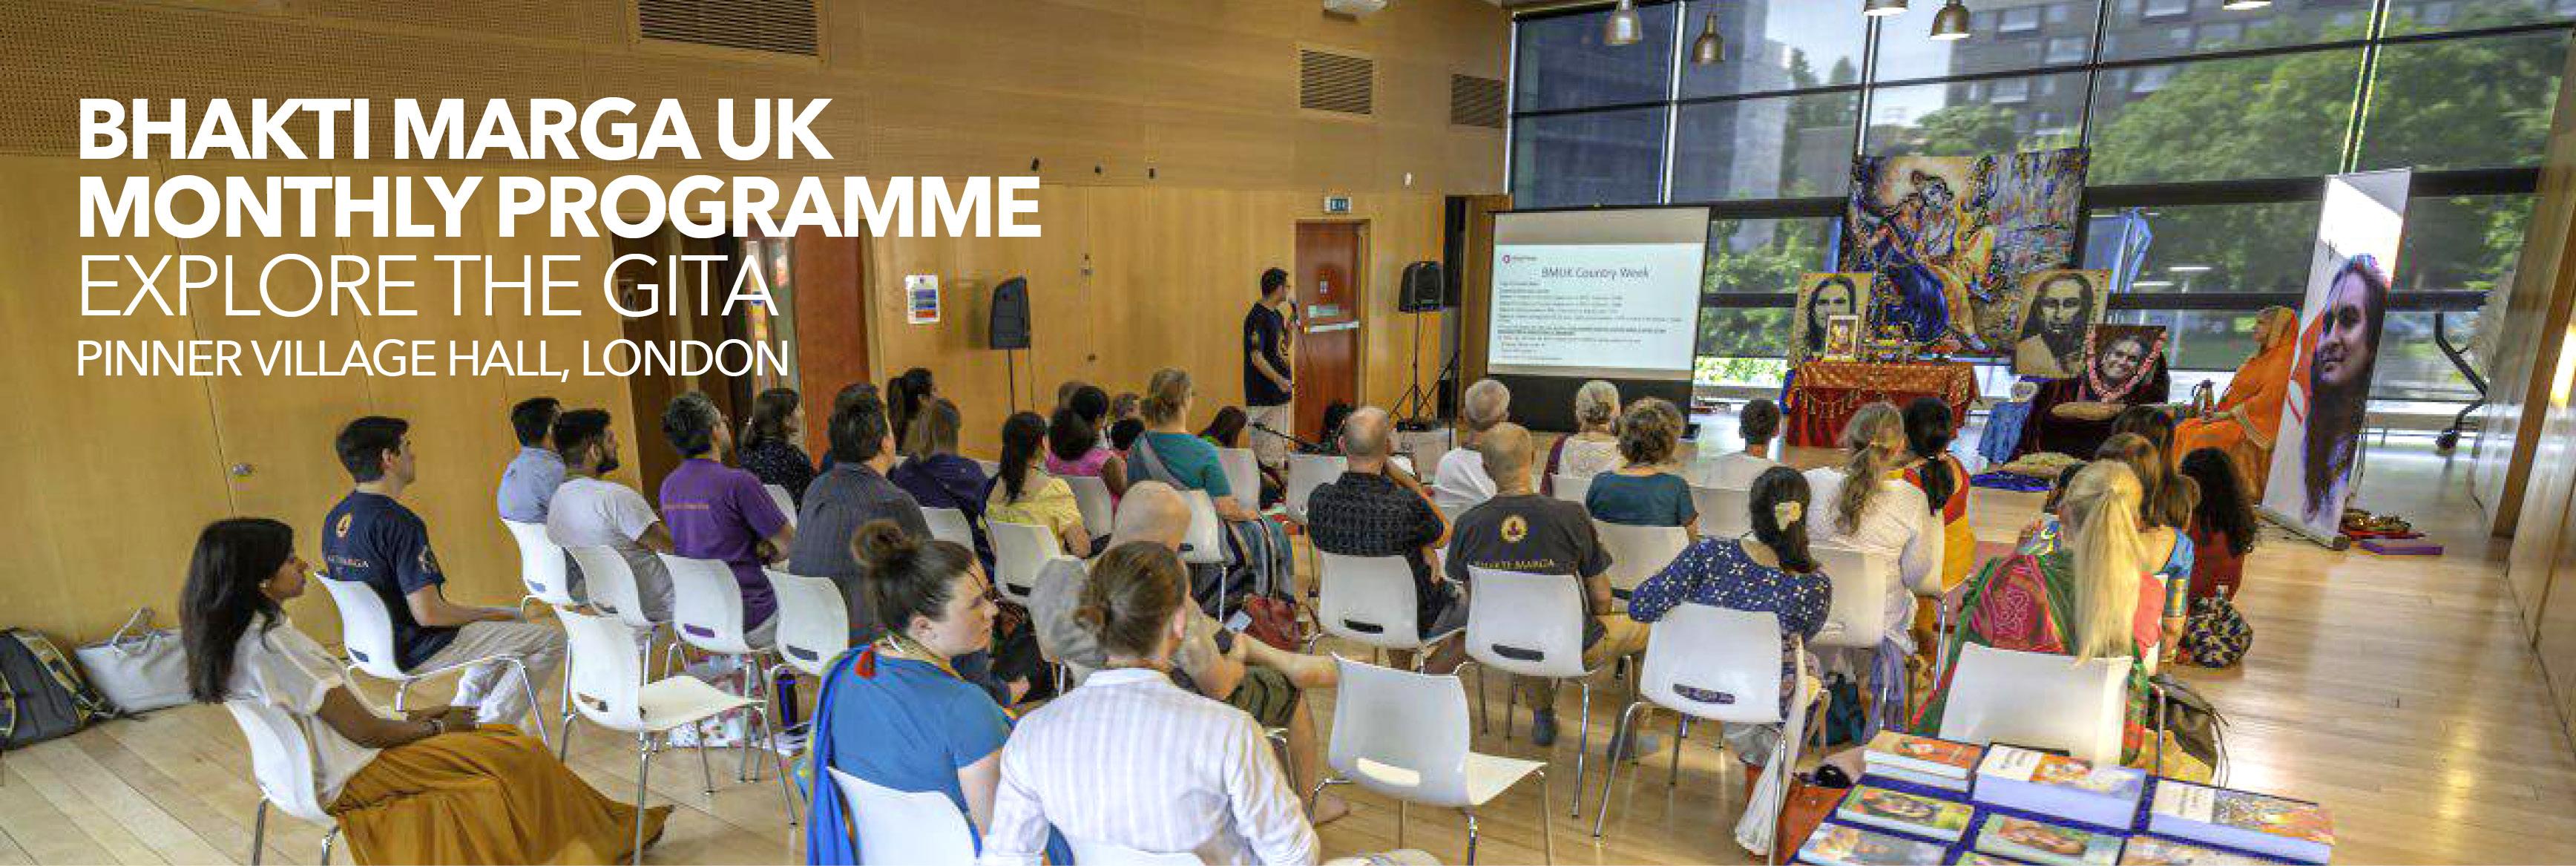 en-uk-BMUK community event-BMUK website banner-2020